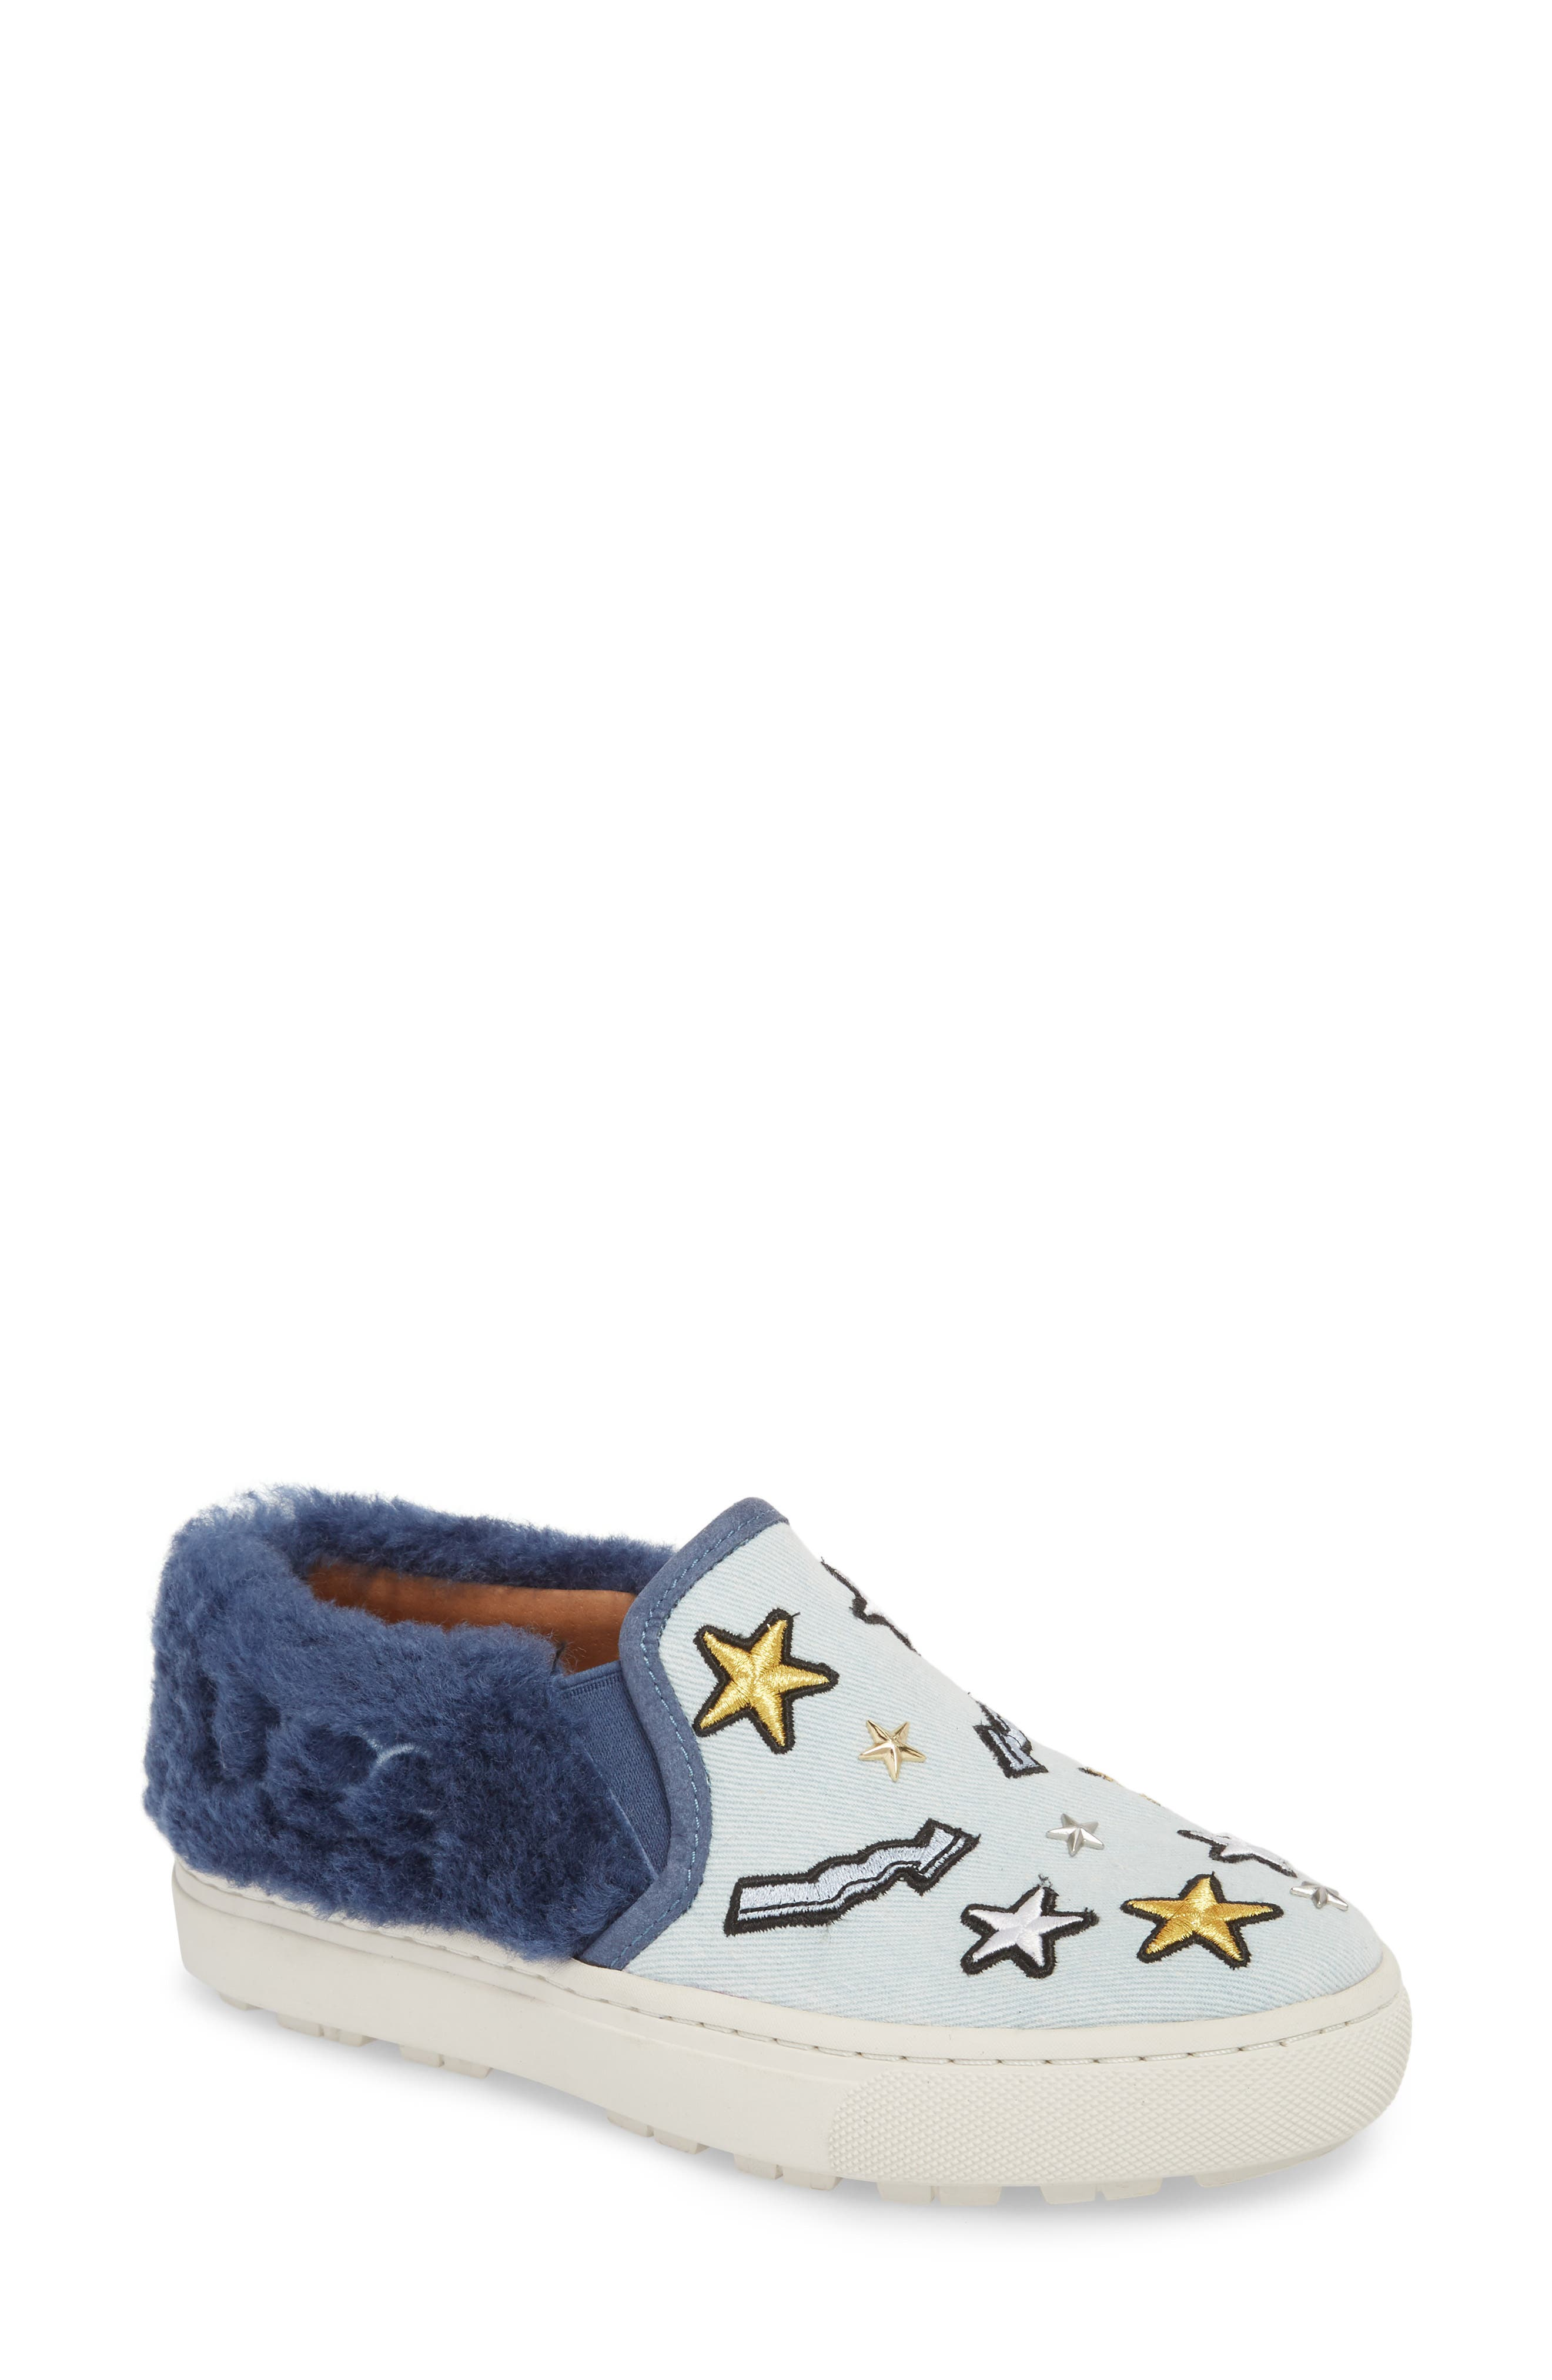 Patch It Genuine Shearling Trim Slip-On Sneaker,                         Main,                         color, BLEACH DENIM